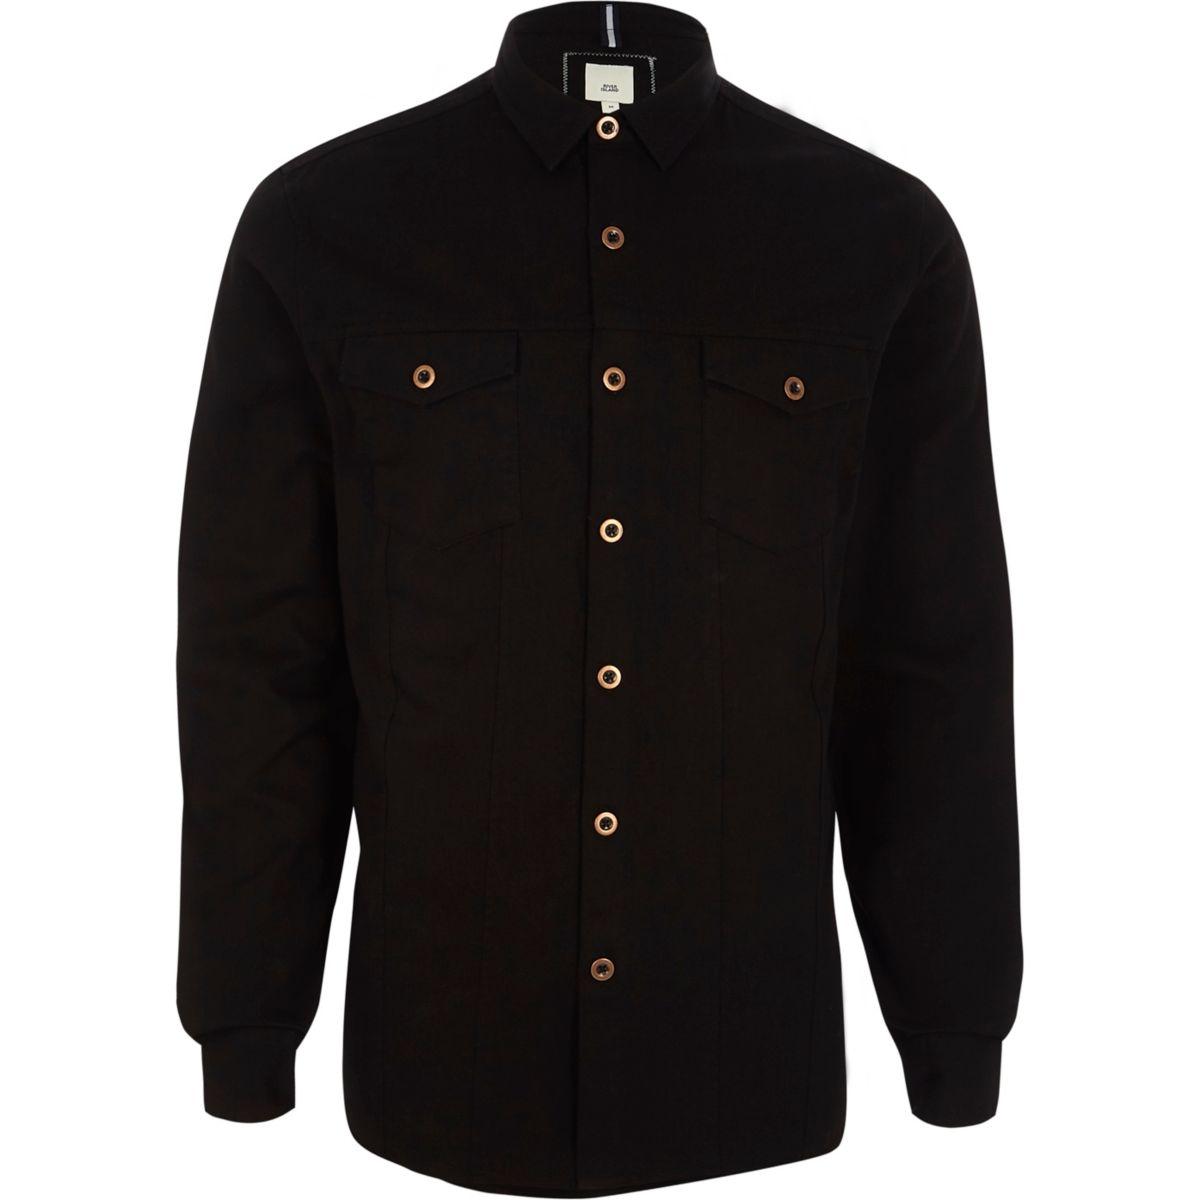 Black button-up overshirt